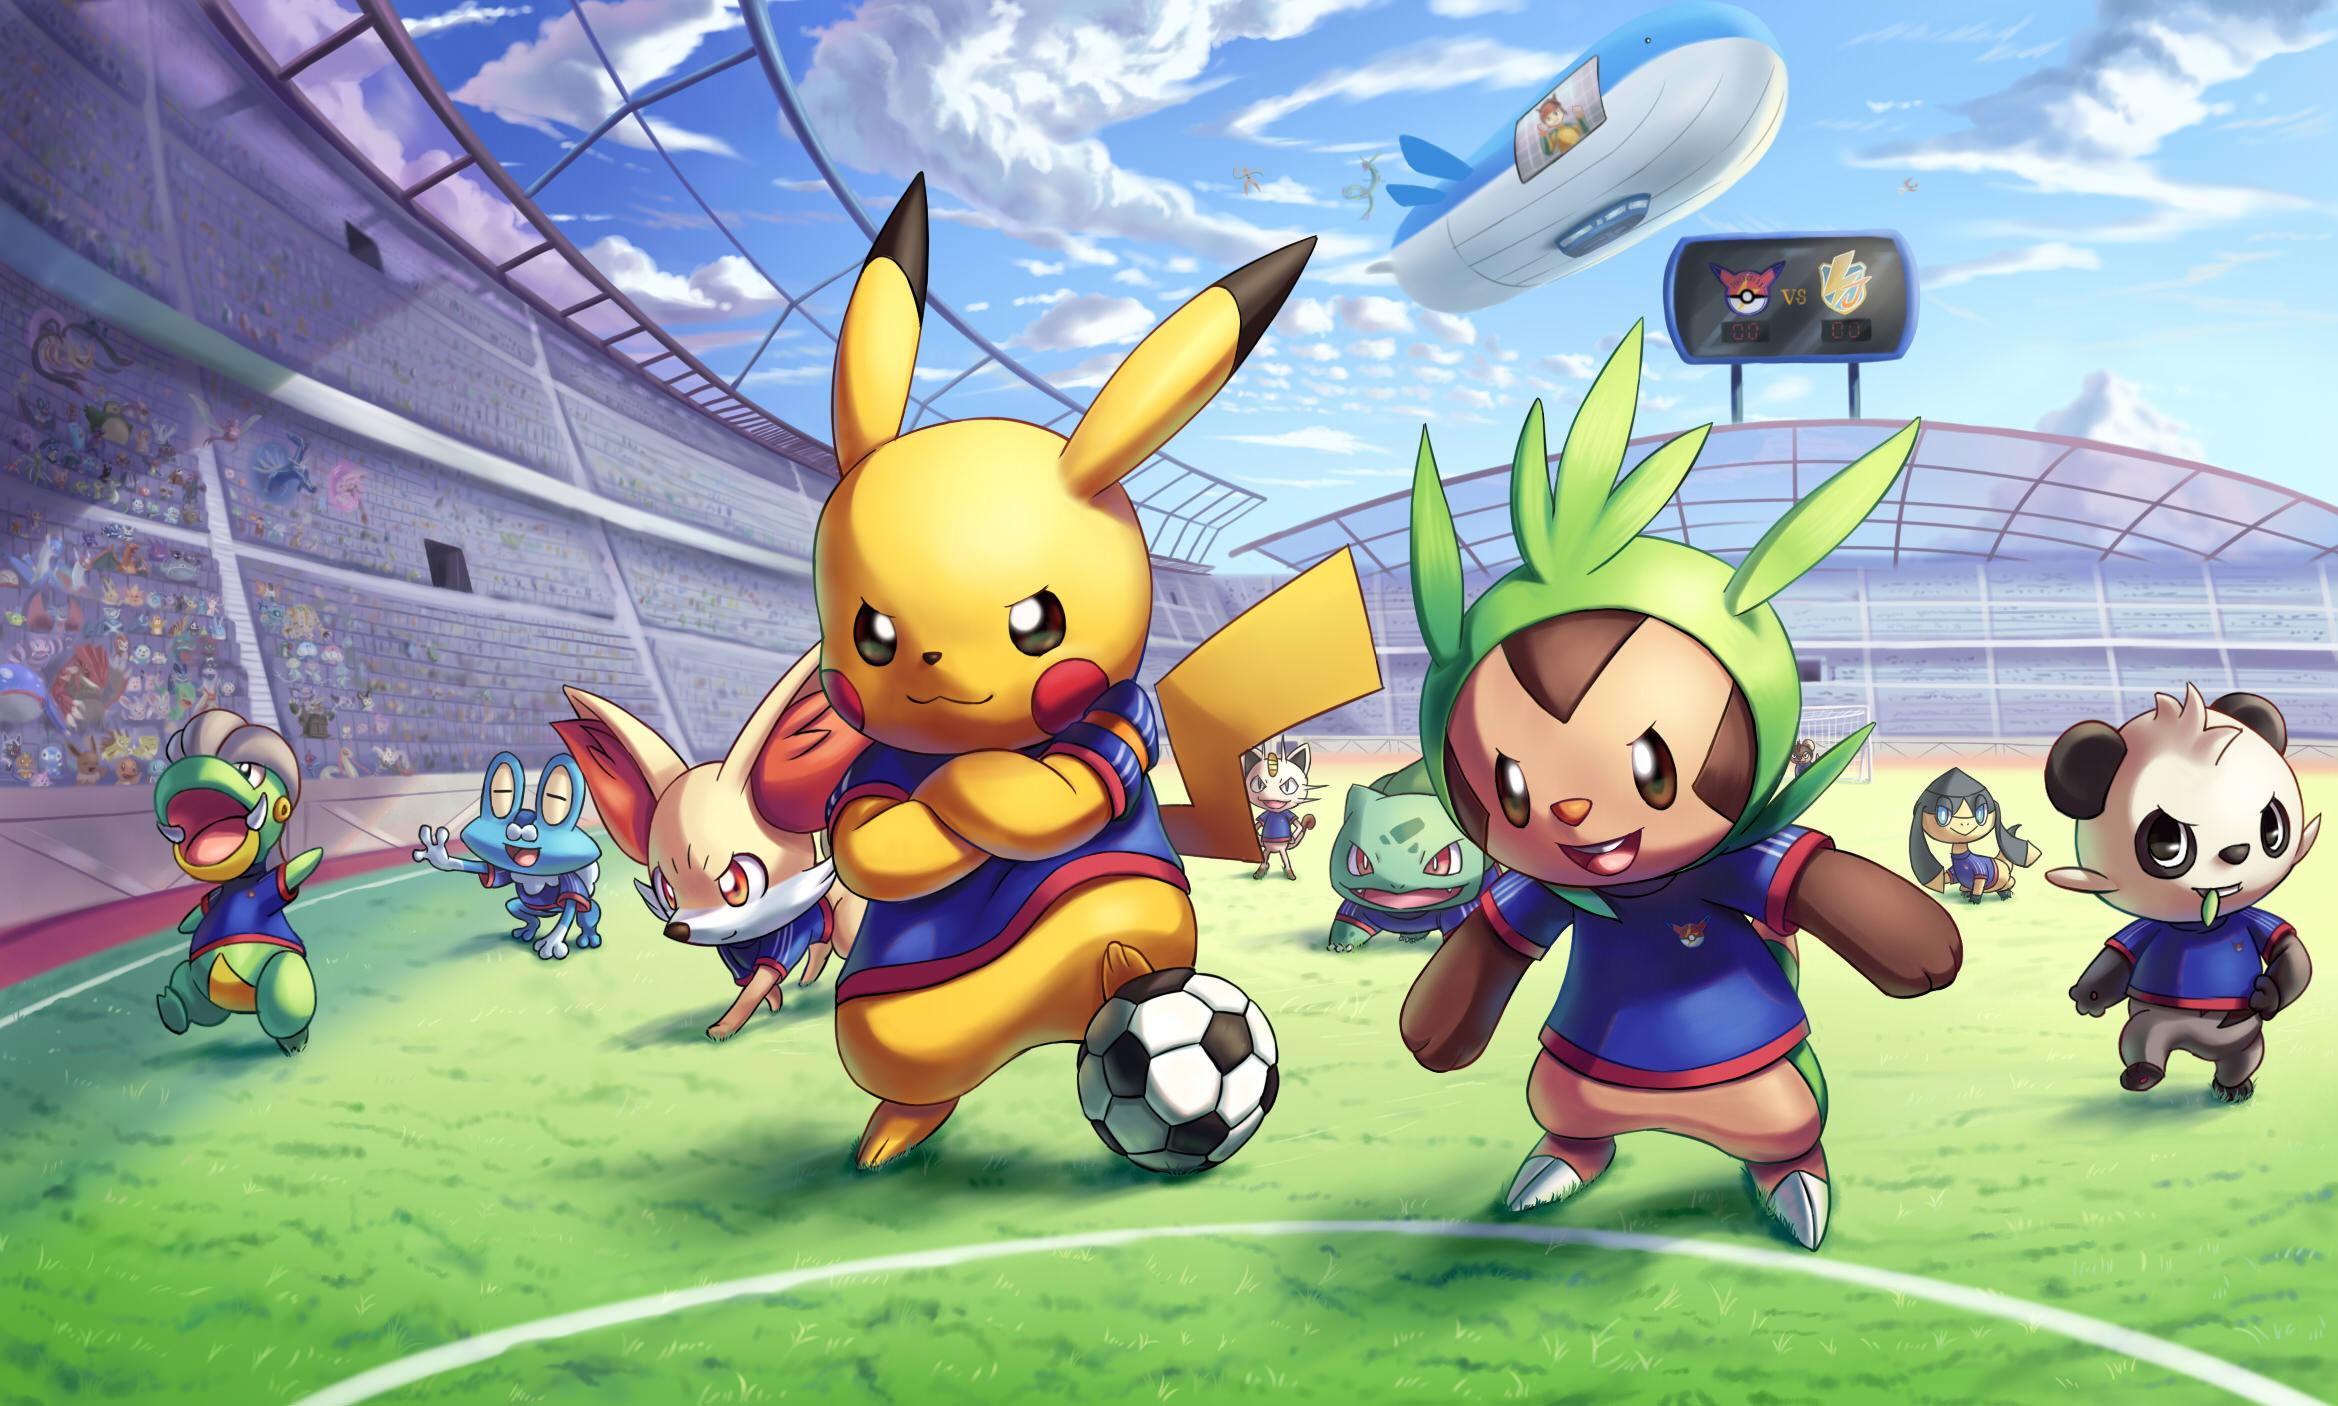 Amazing Pokemon Background Wallpaper